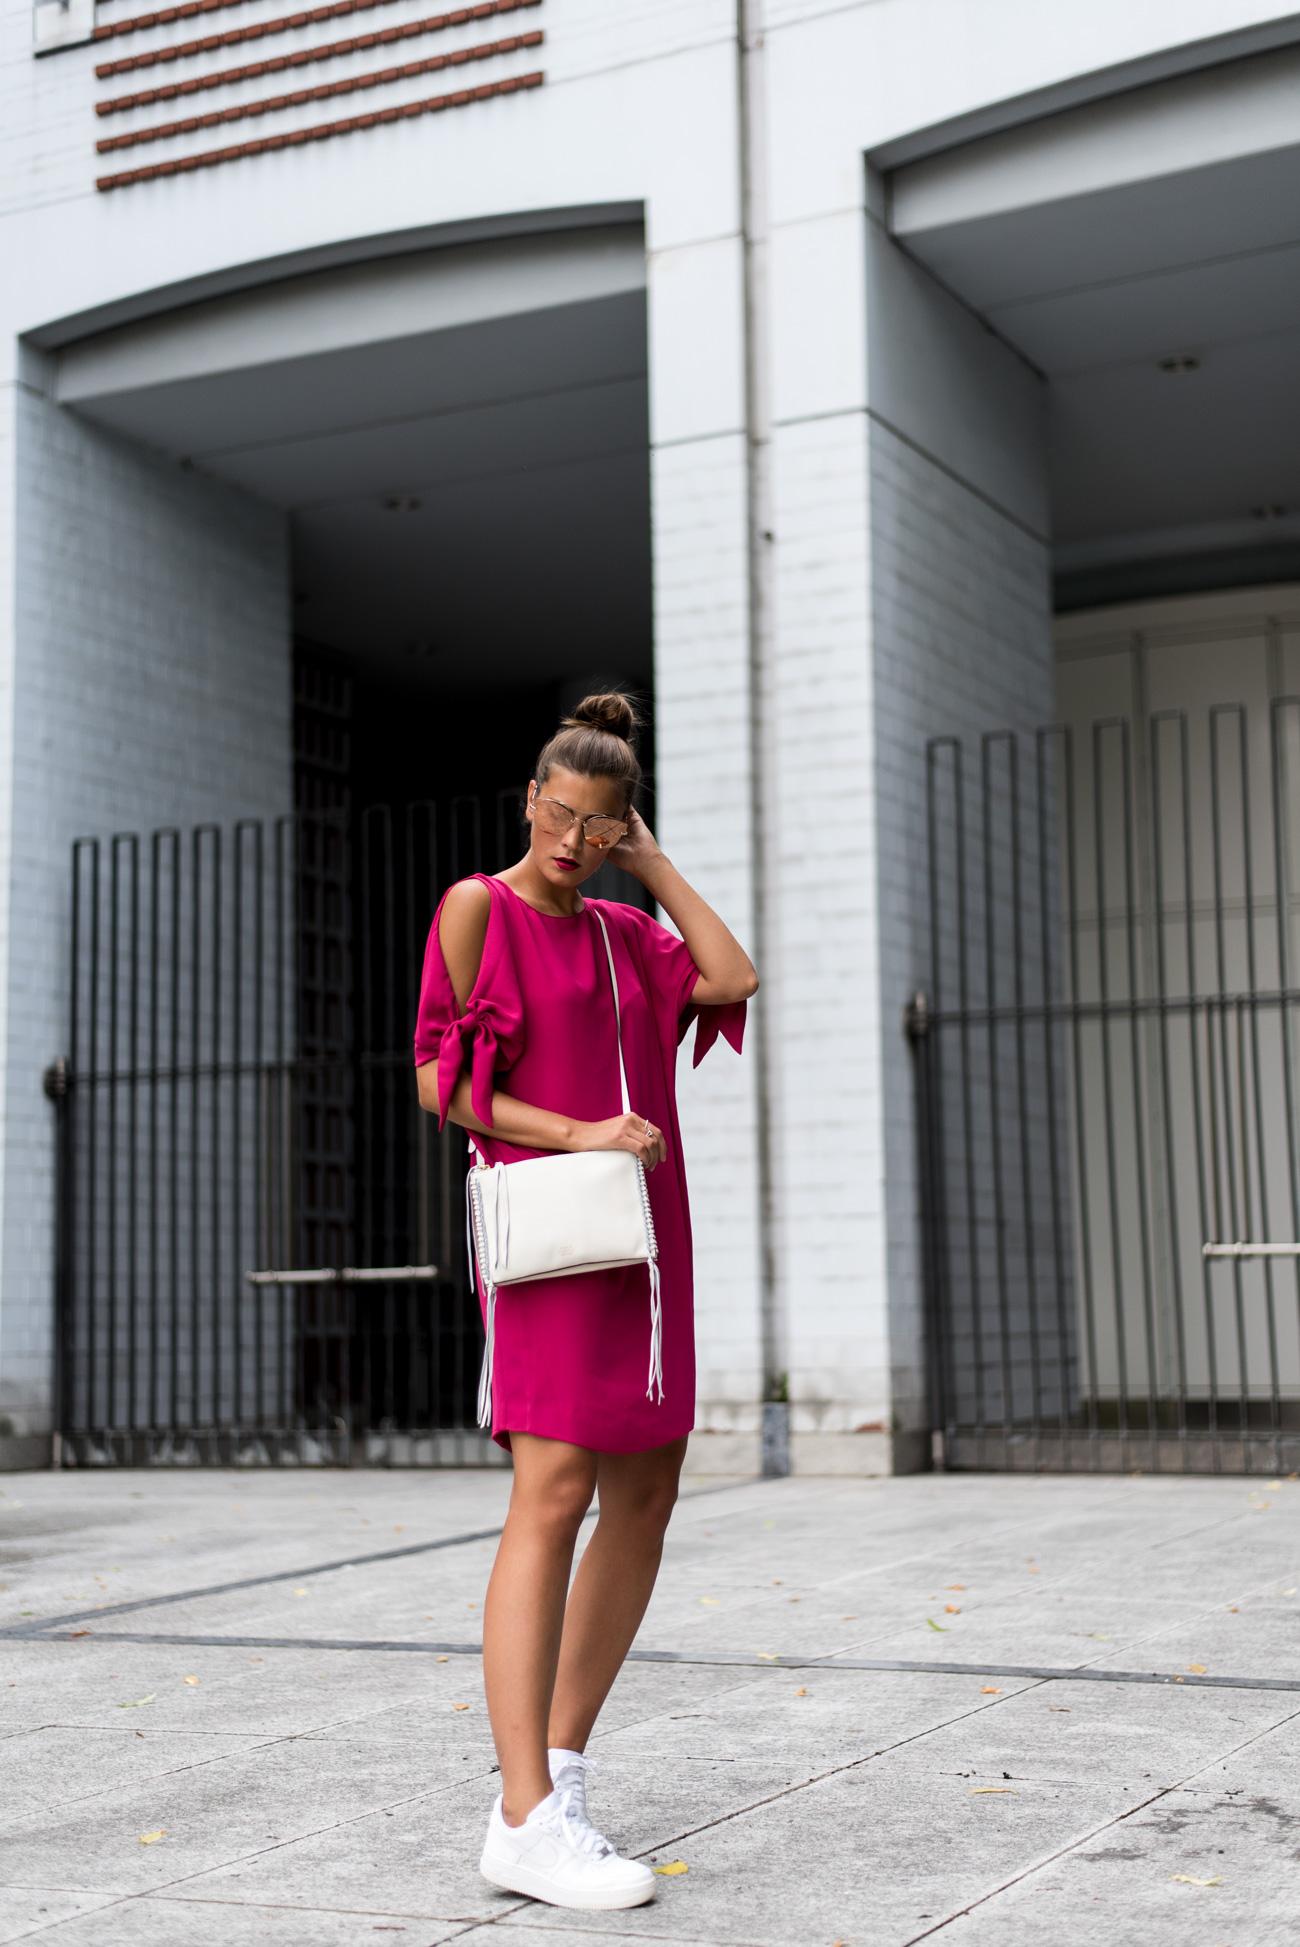 top-knot-frisur-haar-style-frisuren-trends-2017-nina-schwichtenberg-fashiioncarpet